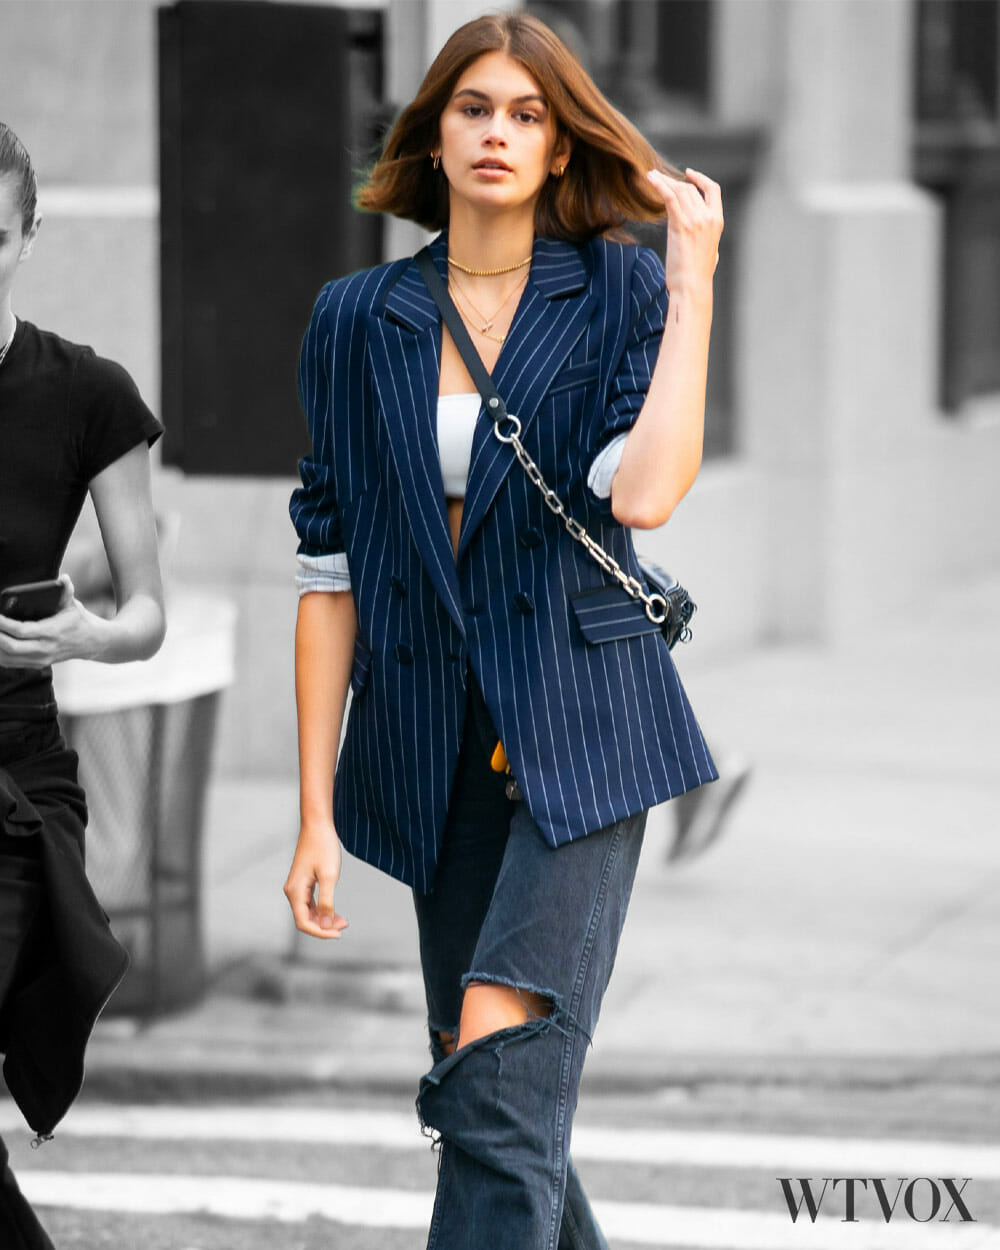 Kaia Gerber Streetwear Fashion Style